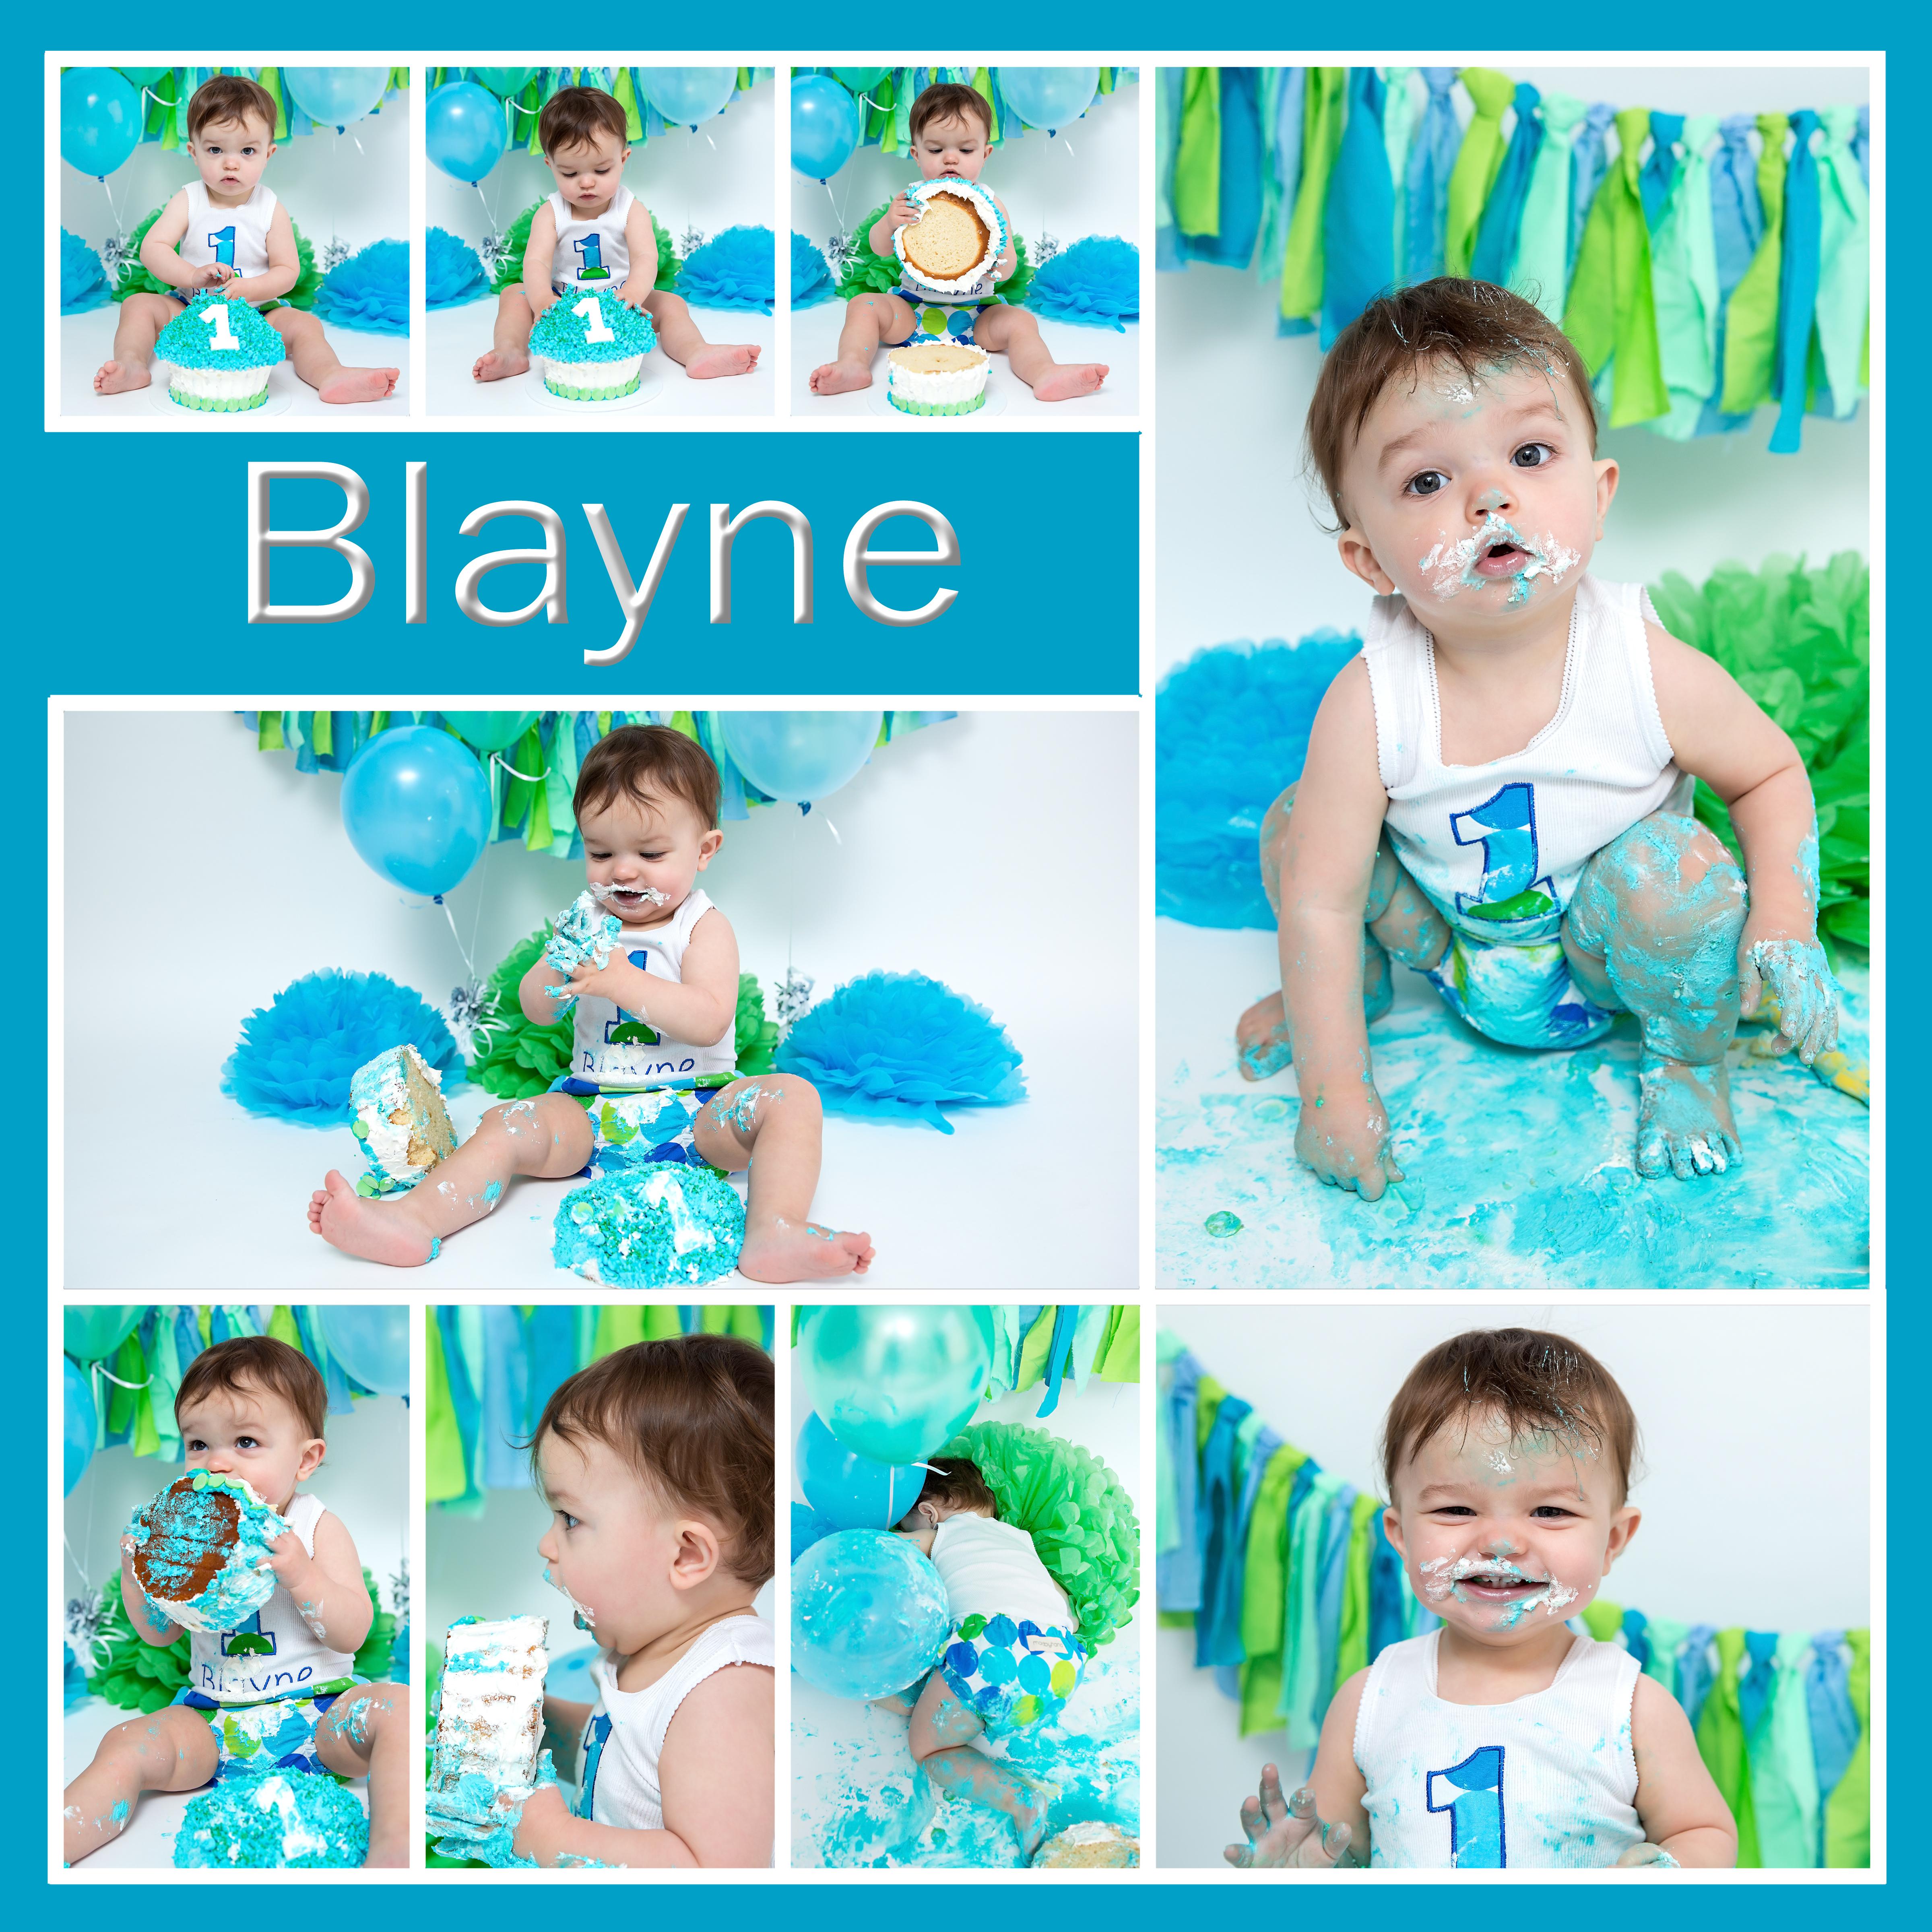 Blayne